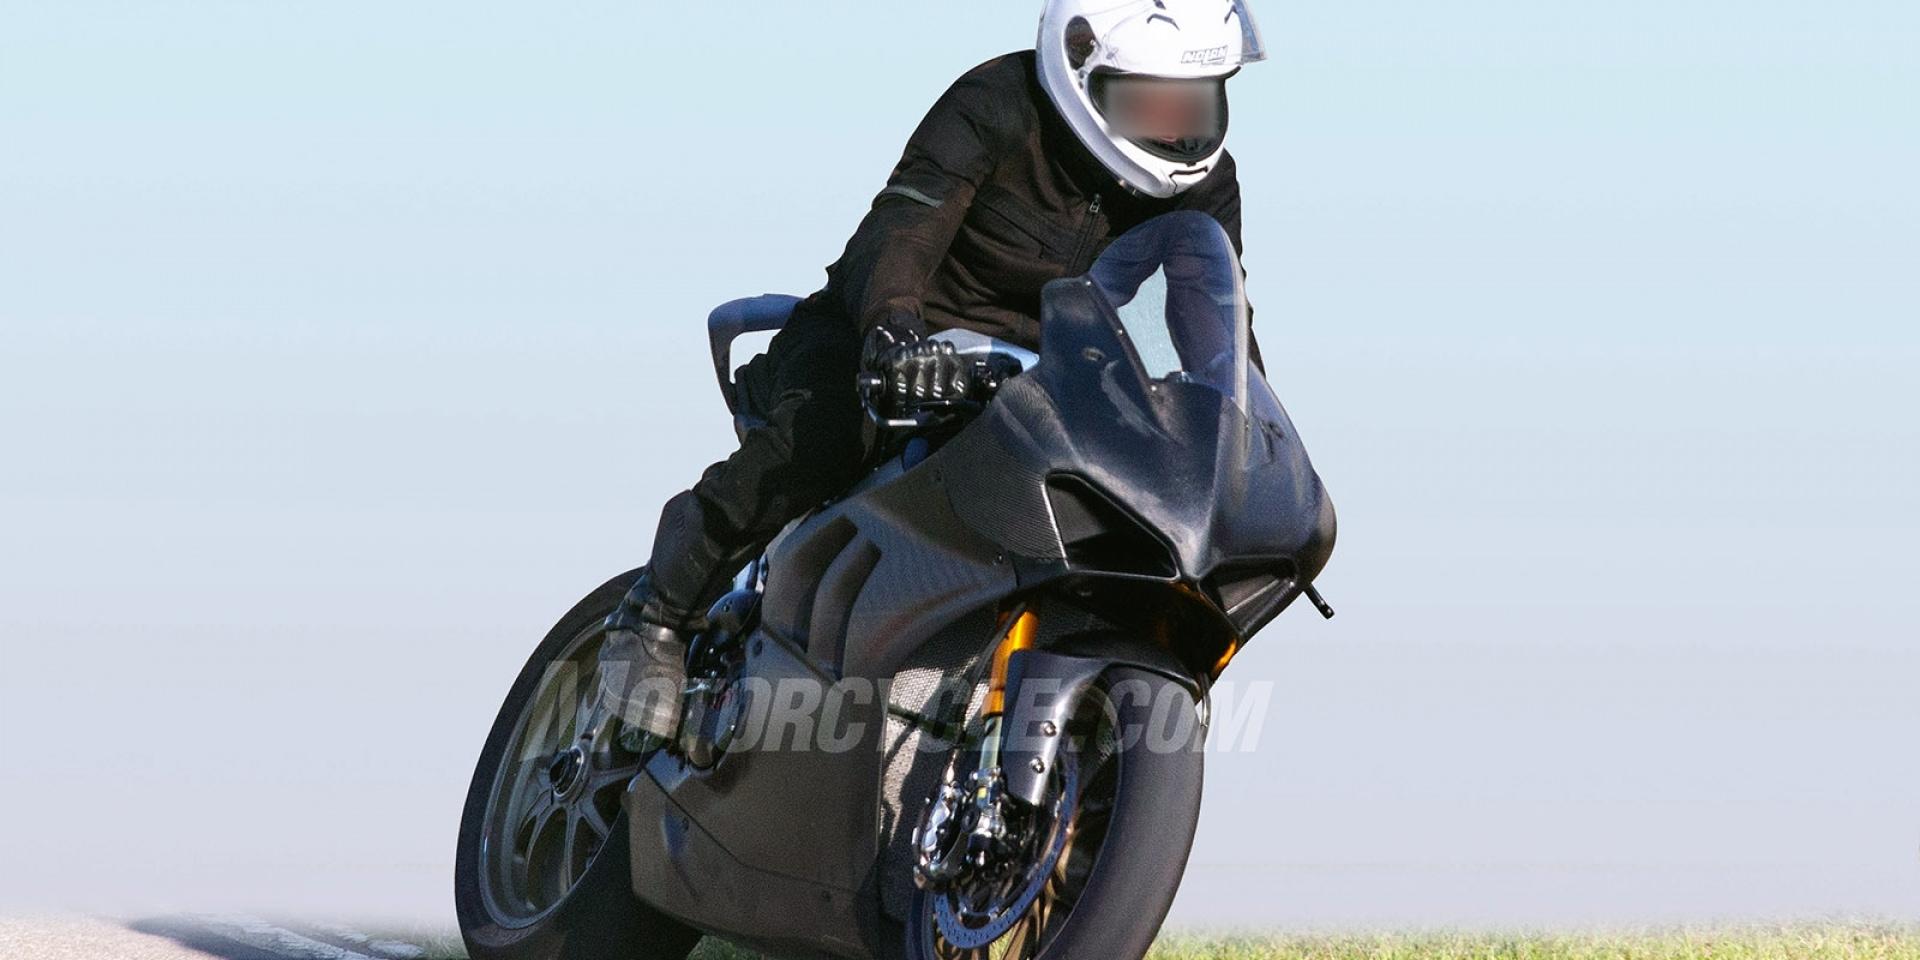 WSBK V4引擎來襲,Ducati Panigale V4 R測試中